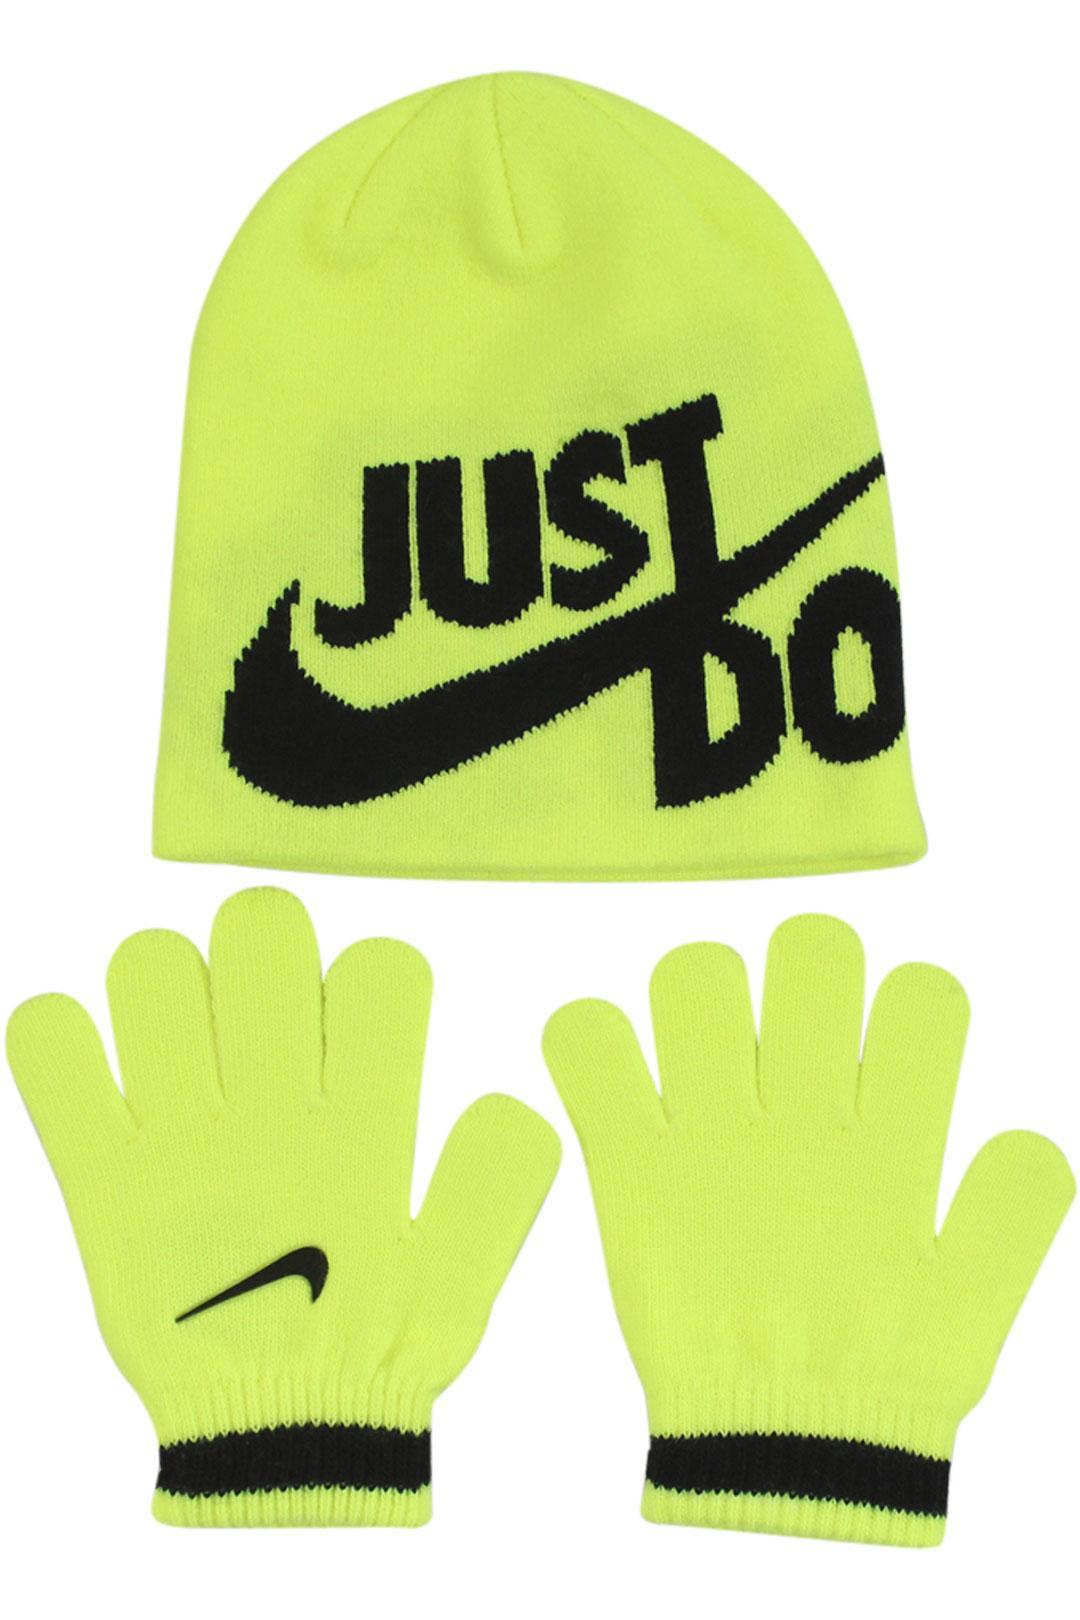 Image of Nike Boy's Just Do It 2 Piece Beanie Hat & Gloves Set - Volt - 4/7